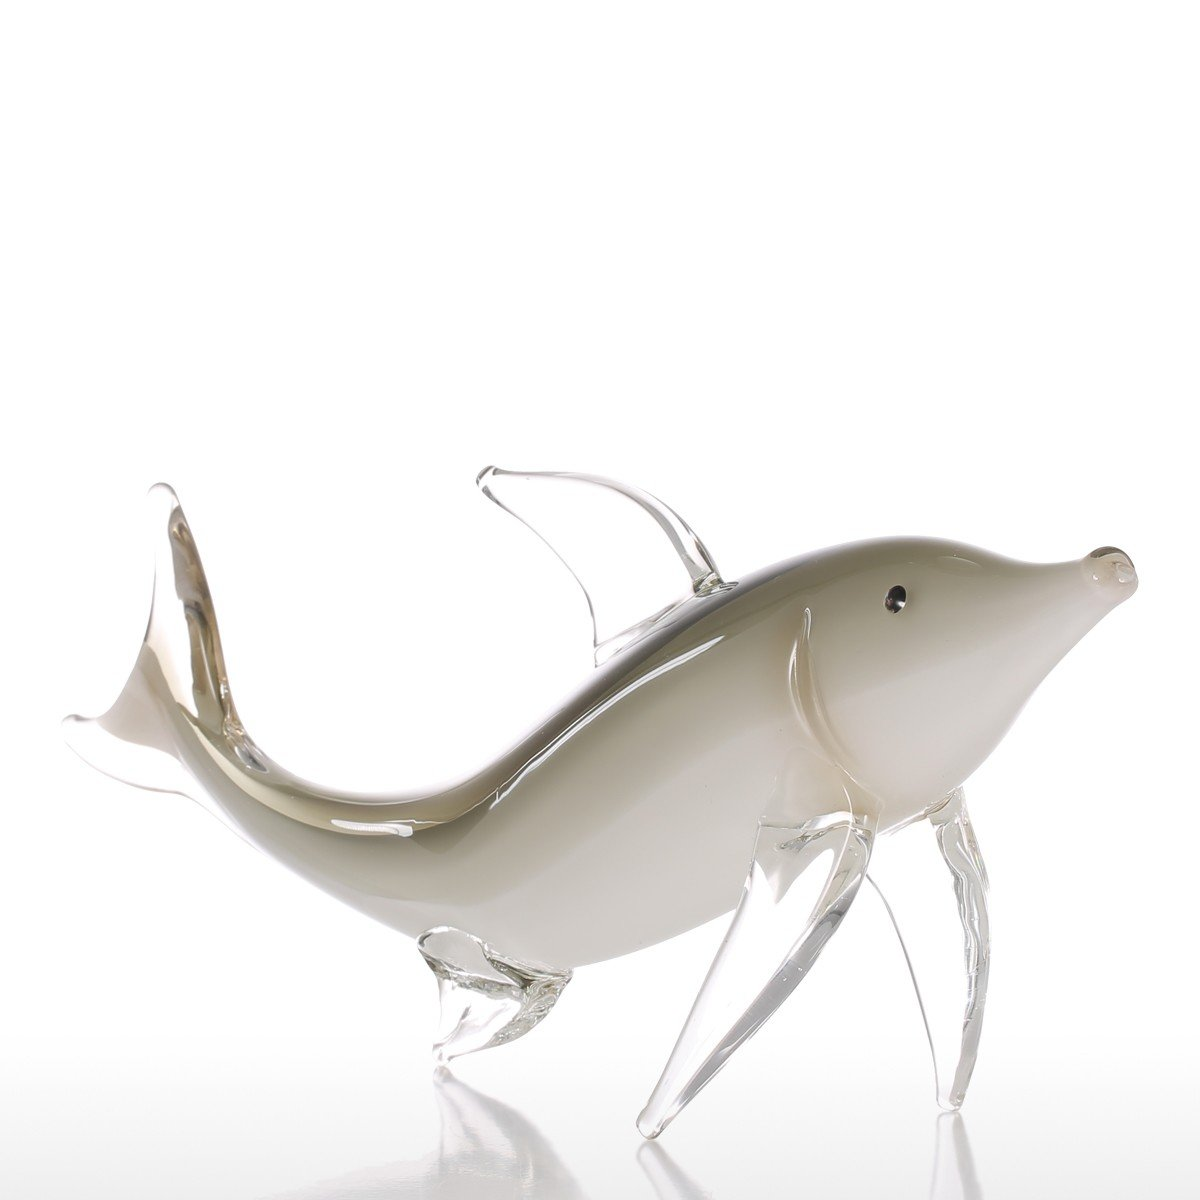 Tooarts Grey Fish Gift Glass Ornament Animal Figurine